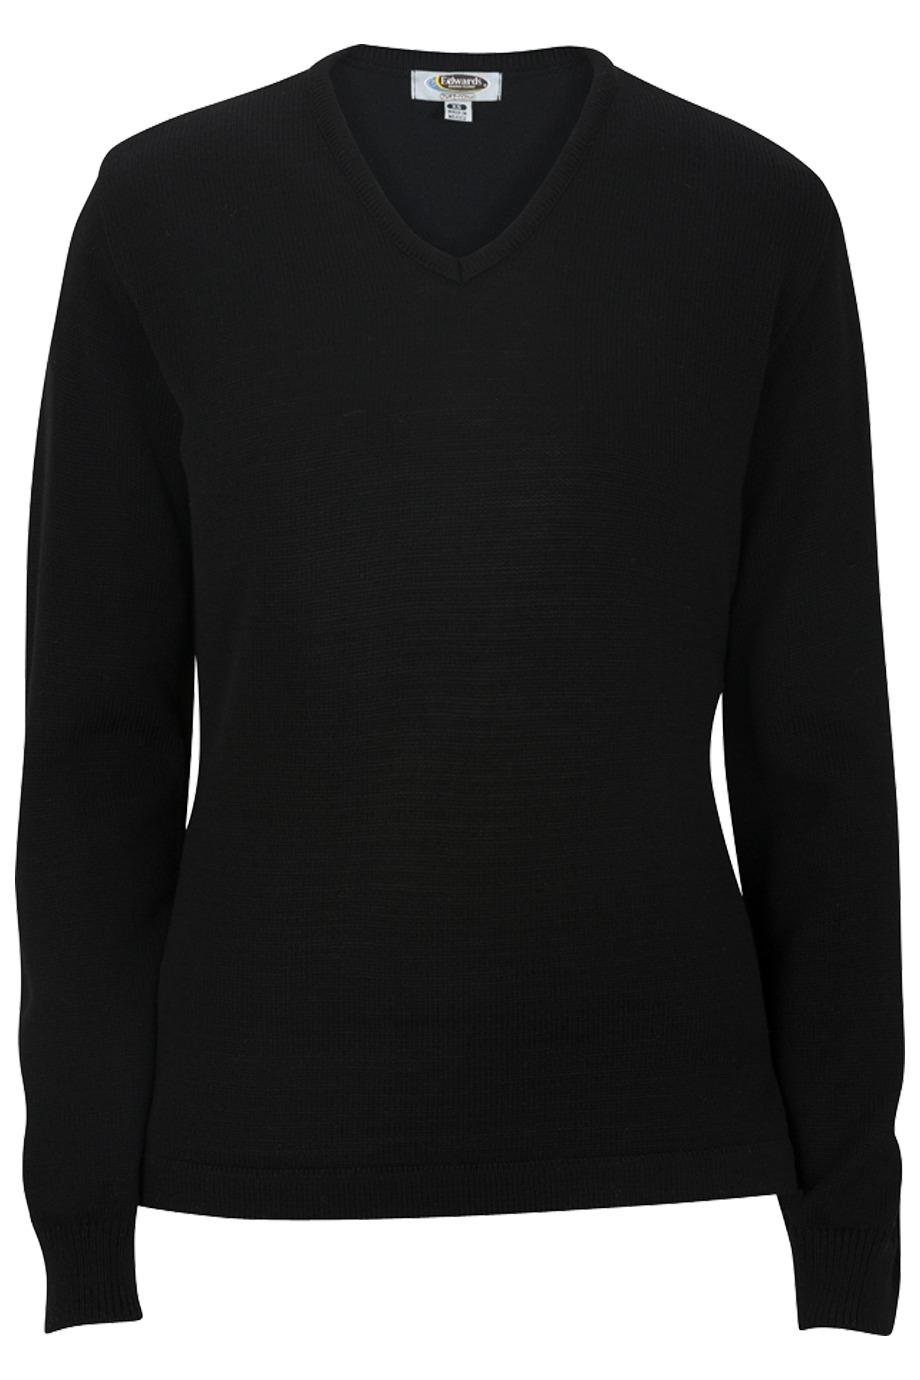 Edwards Garment 7065 - Ladies' V-Neck Sweater Tuff-Pil Plus